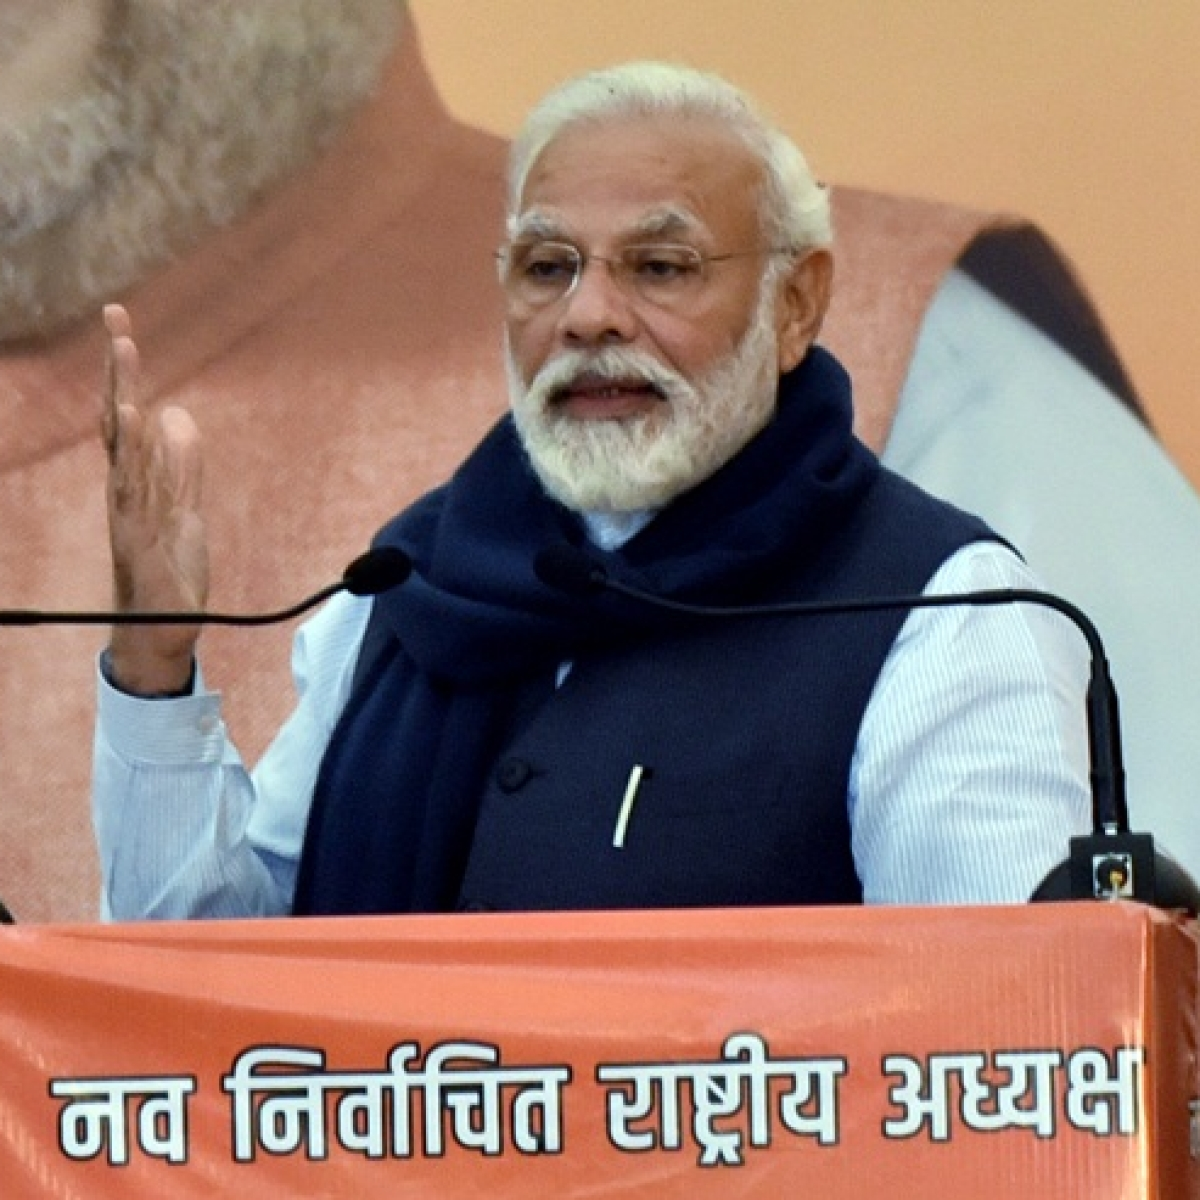 Country expresses gratitude to EC for making electoral process vibrant, participative: PM Modi